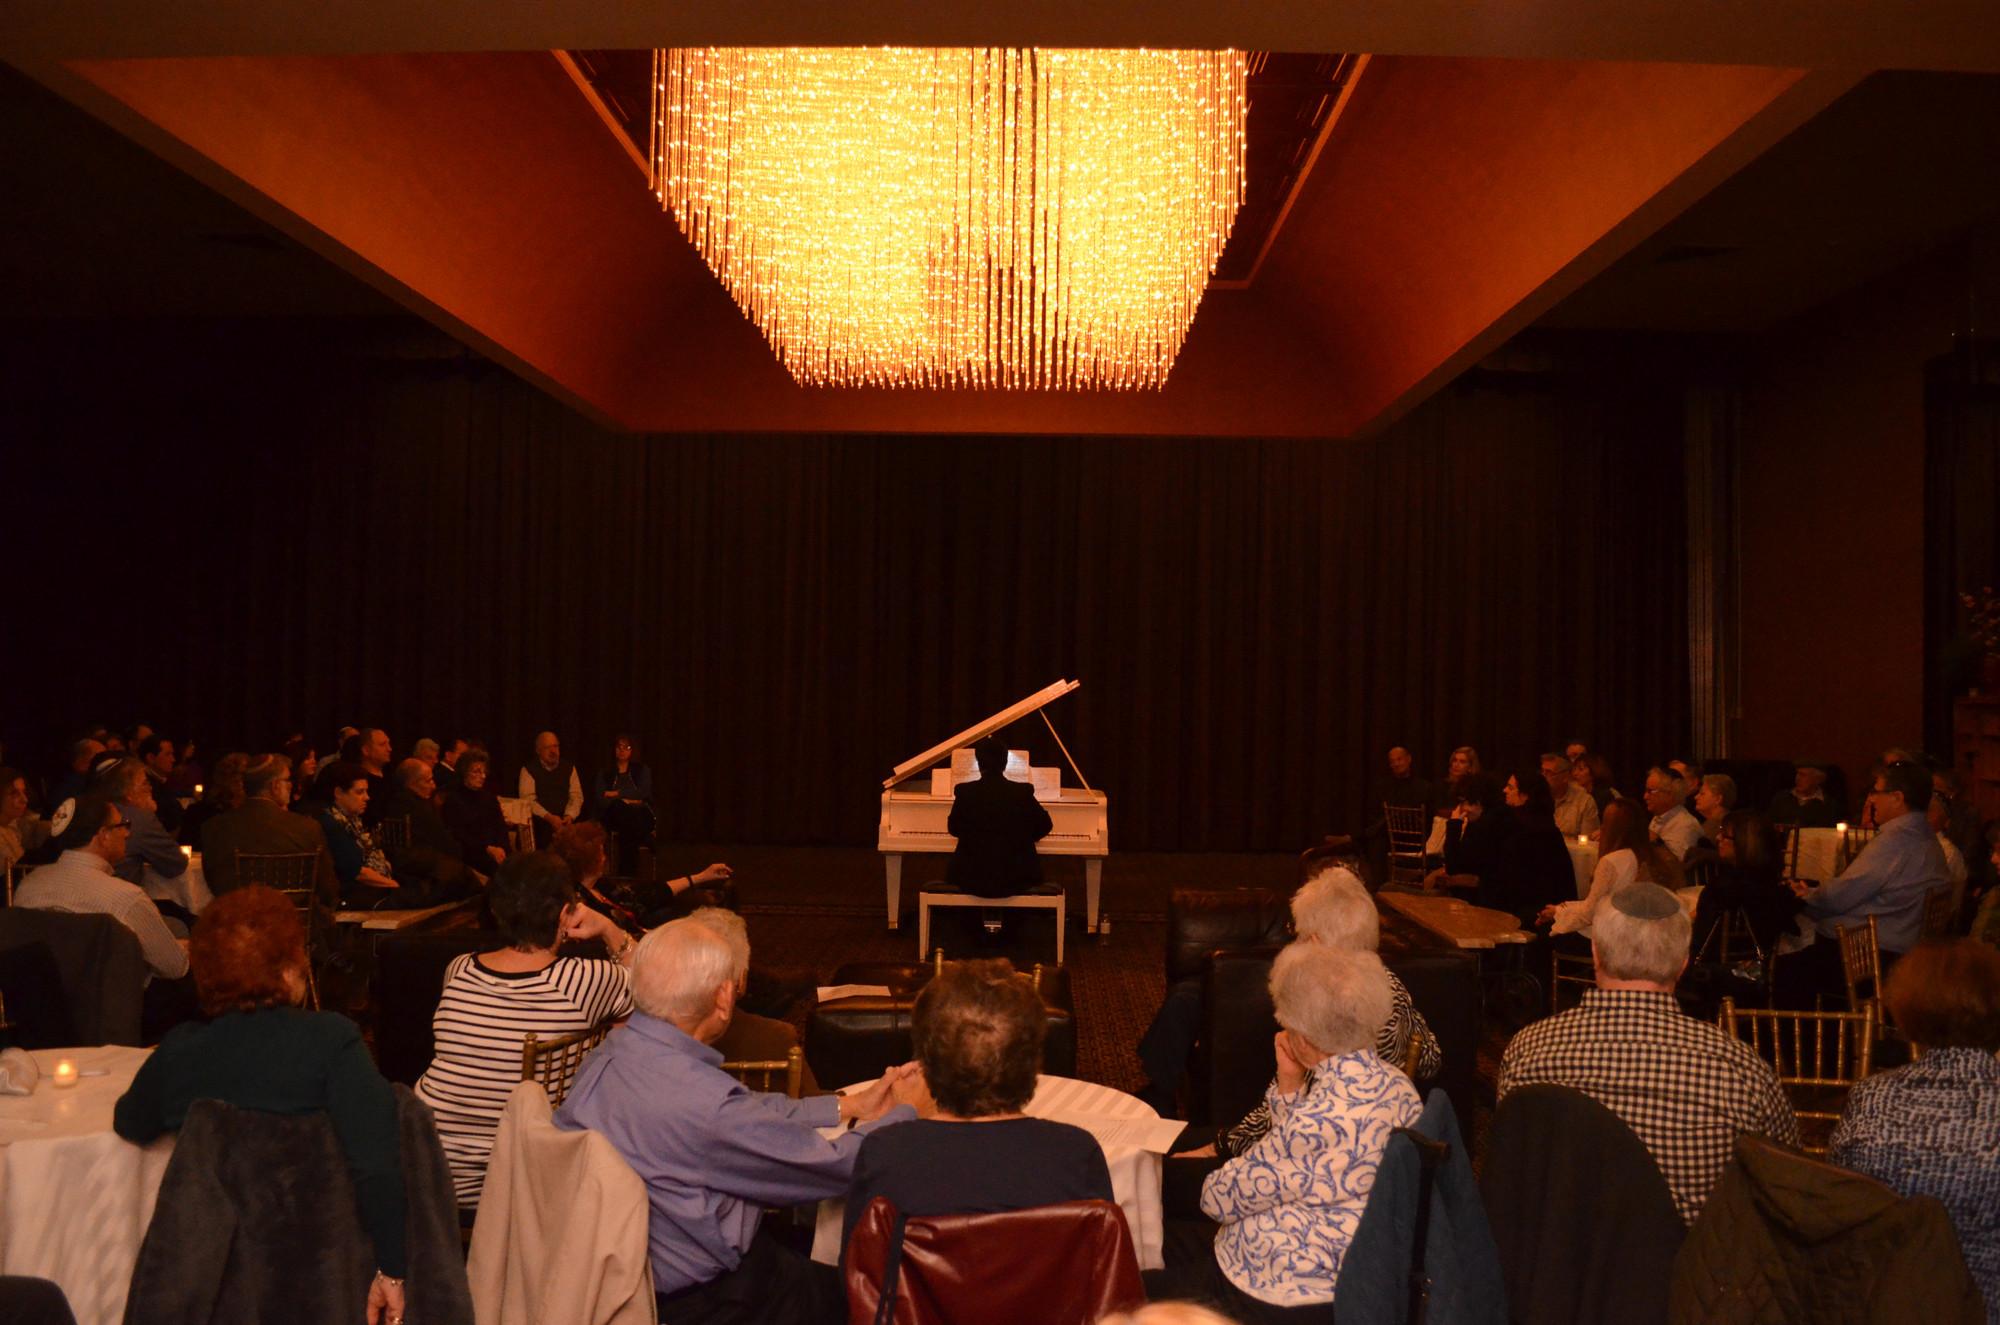 Pianist Wows Jewish Center Crowd